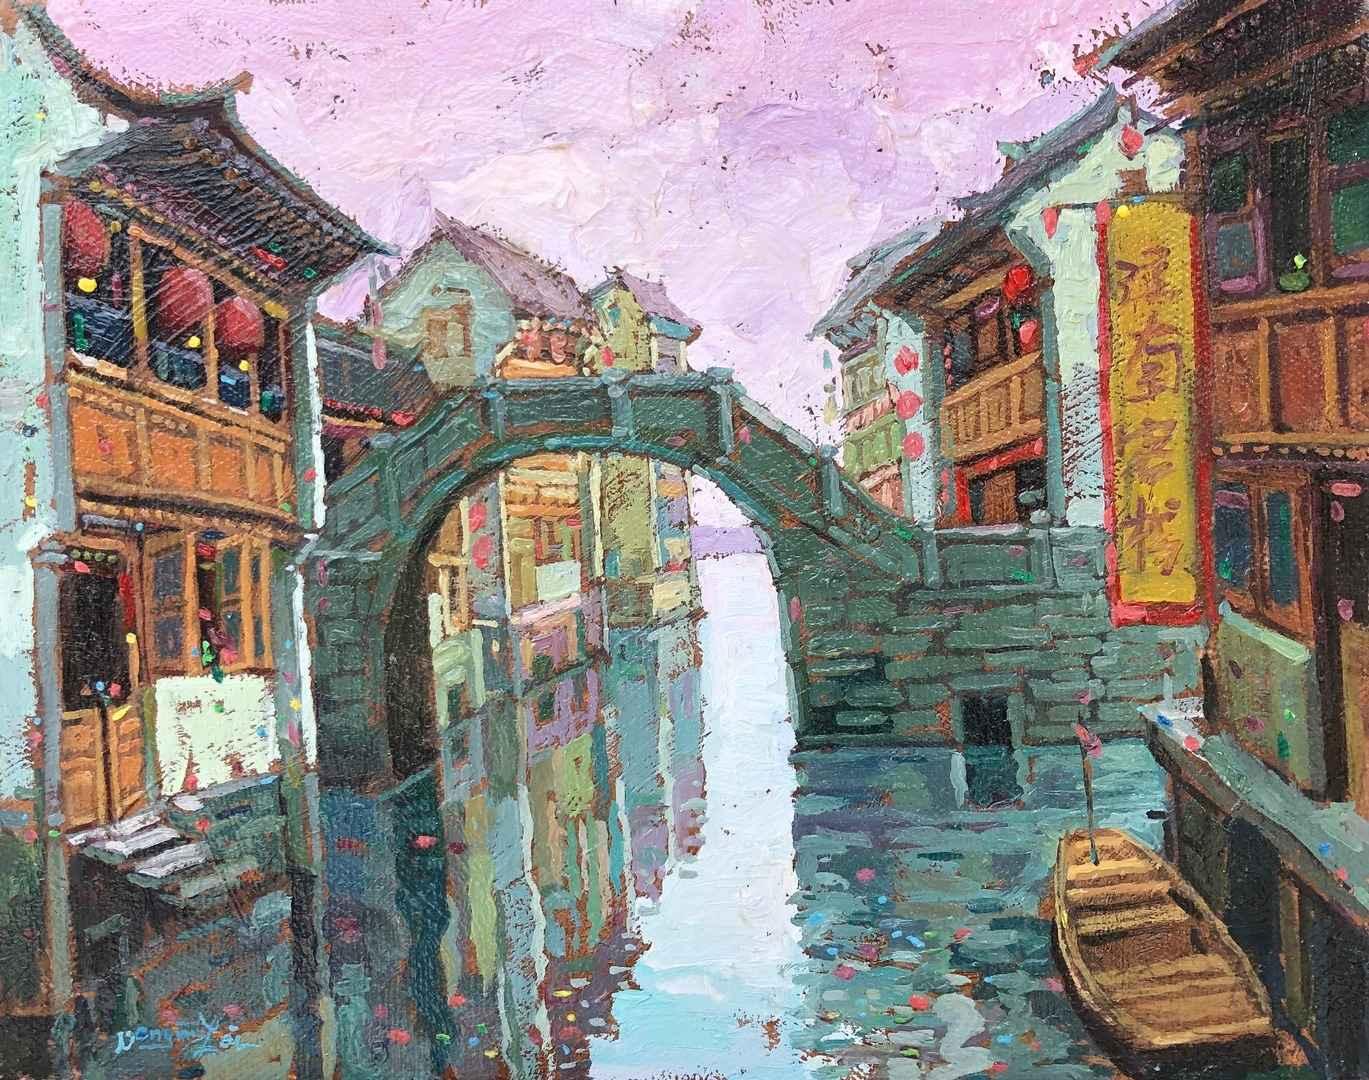 Waterway by  Dongmin Lai - Masterpiece Online